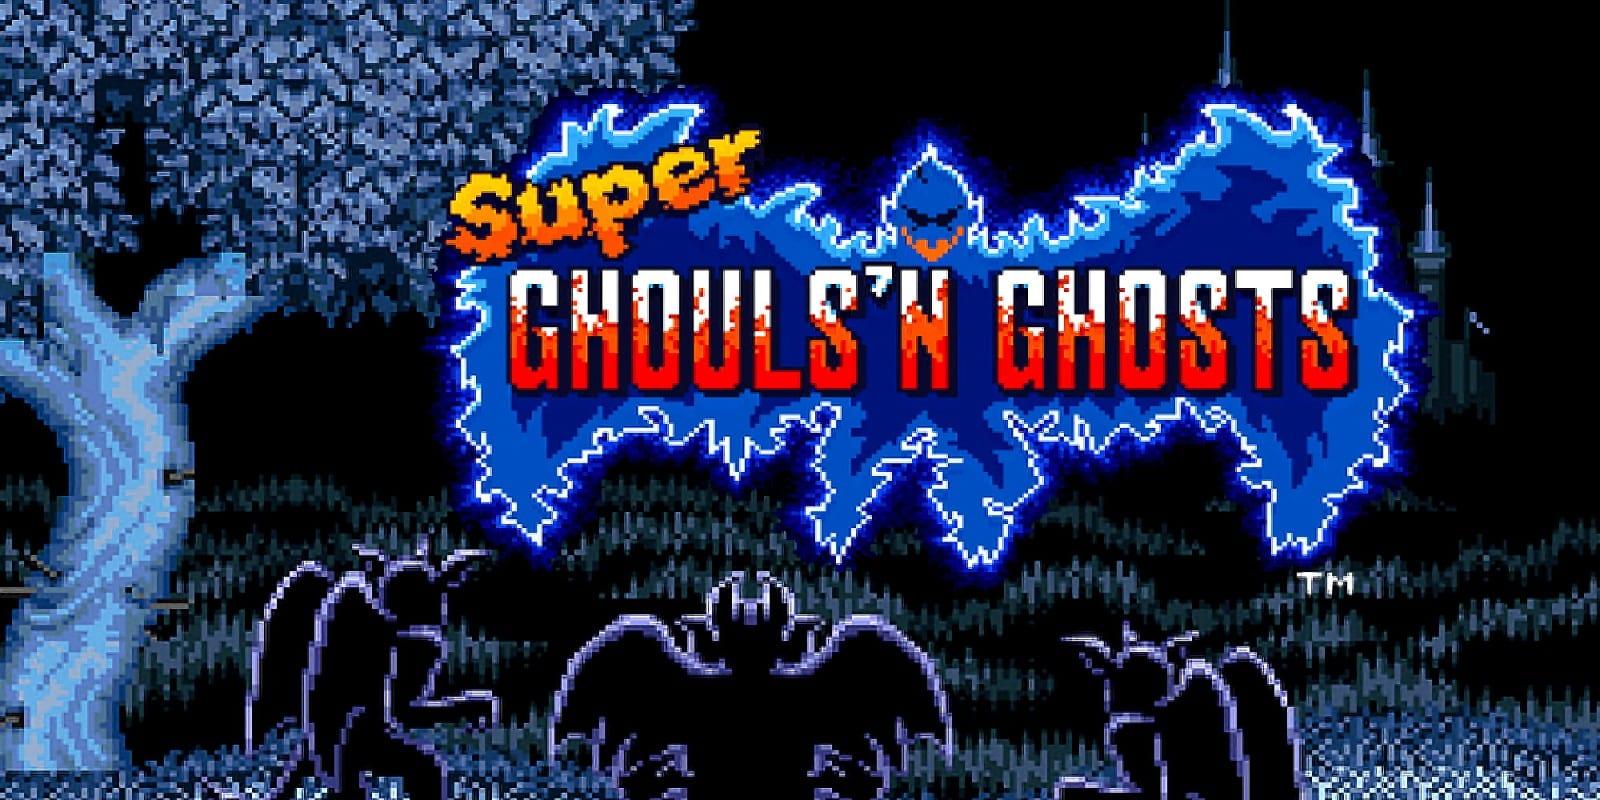 Test Super Ghouls Ghosts Super Nintendo